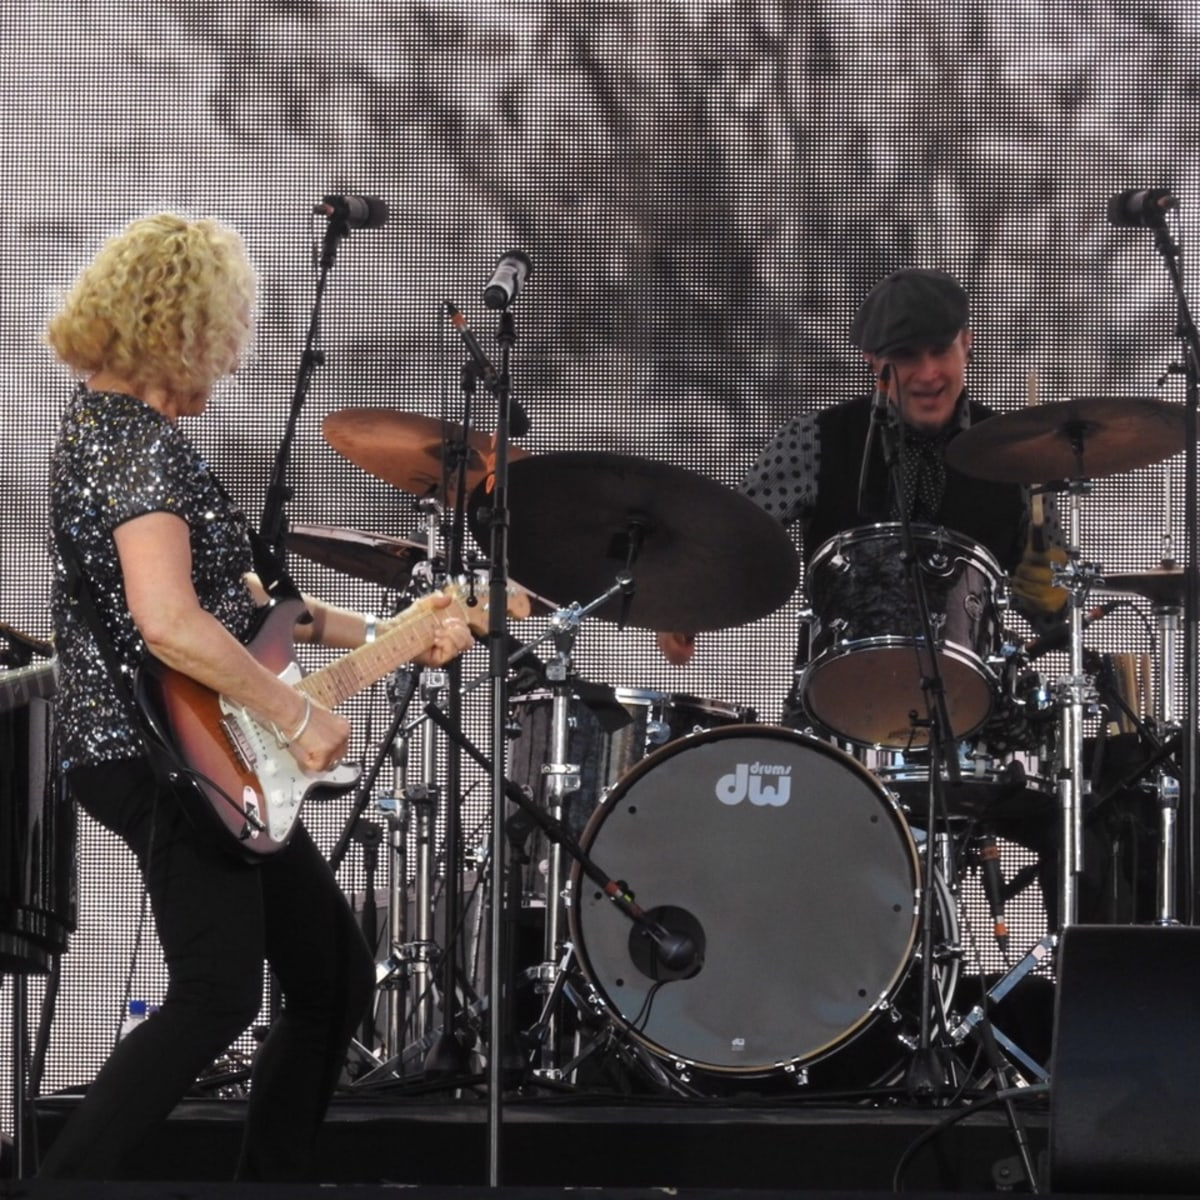 Carole King at London concert playing guitar